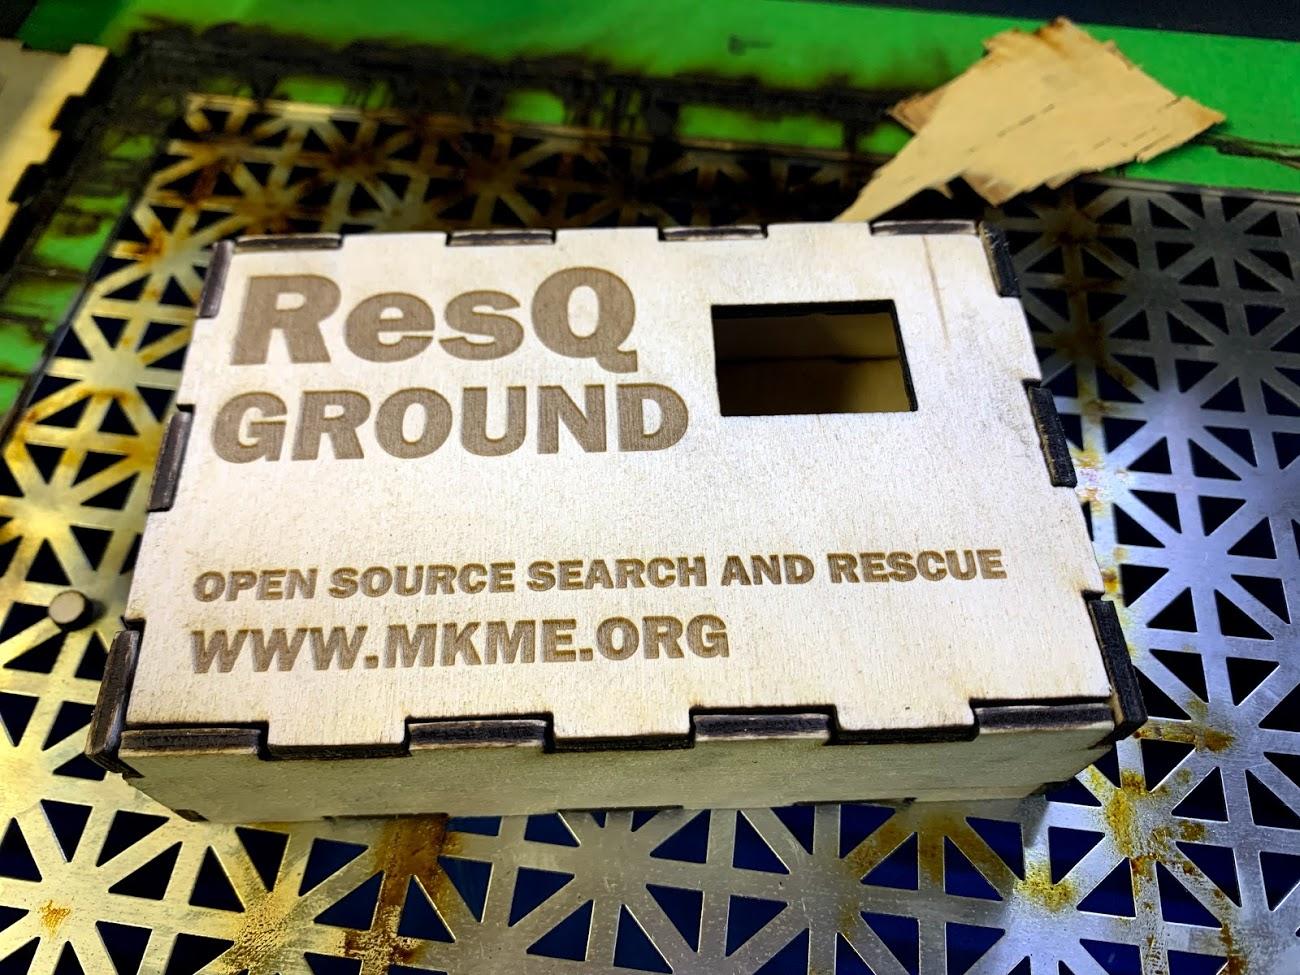 MKME.org laser cutting